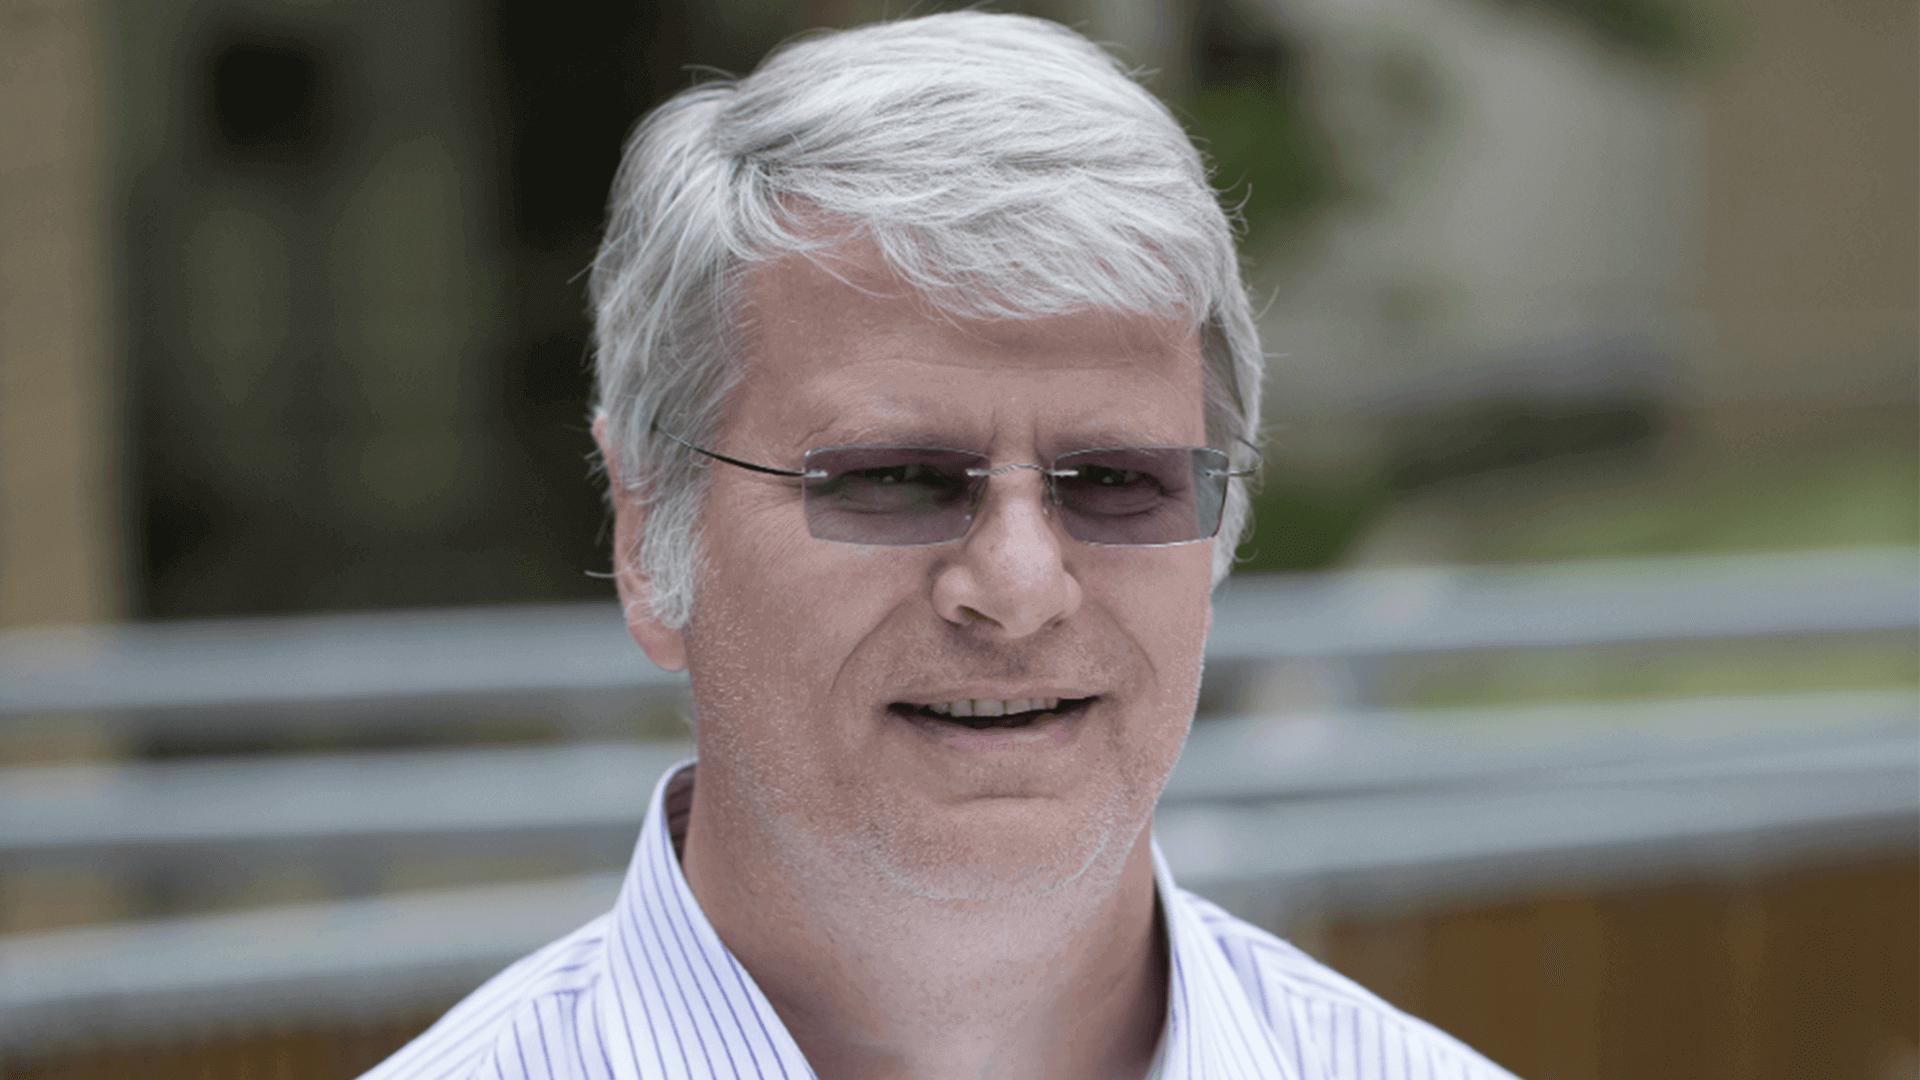 Australian Academic Wins Prestigious Award for Contributions to 3D Printing | All3DP